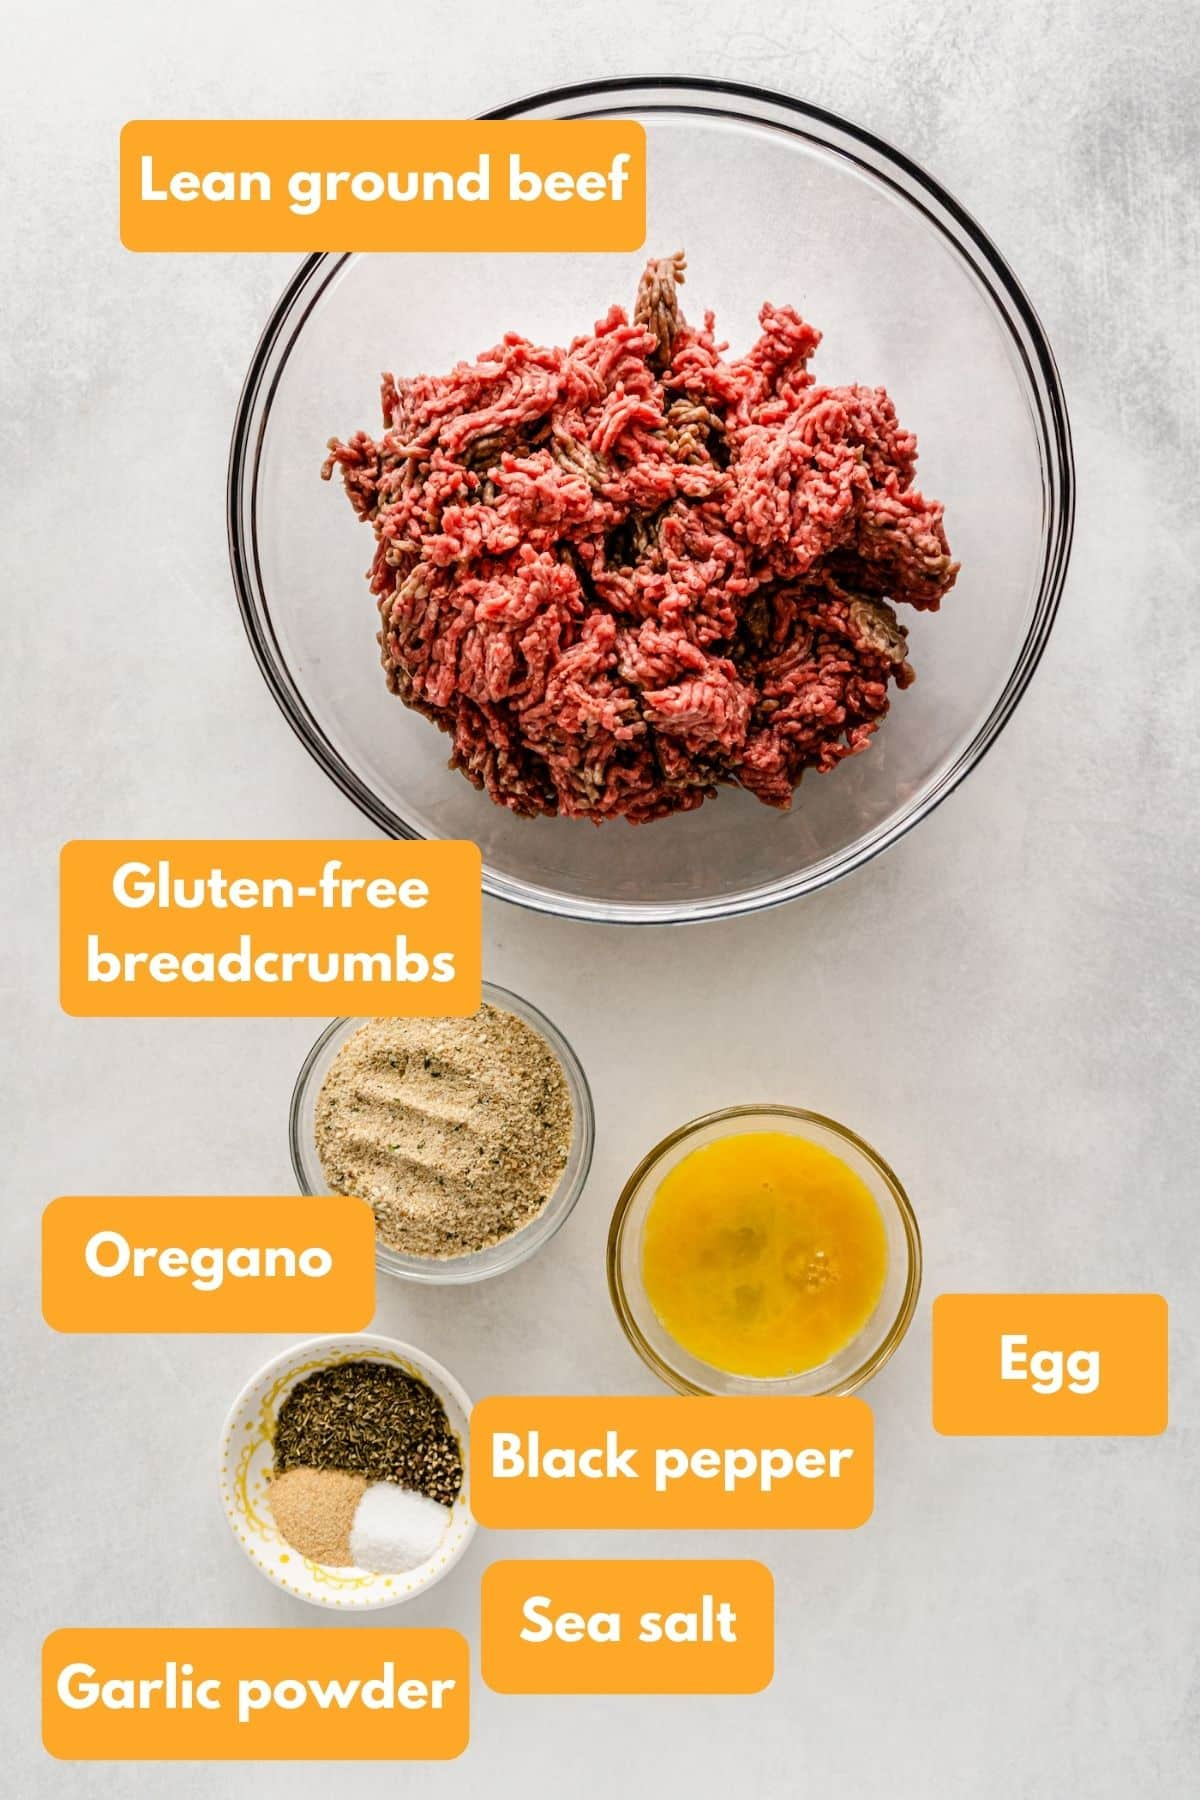 Ingredients for gluten-free meatballs